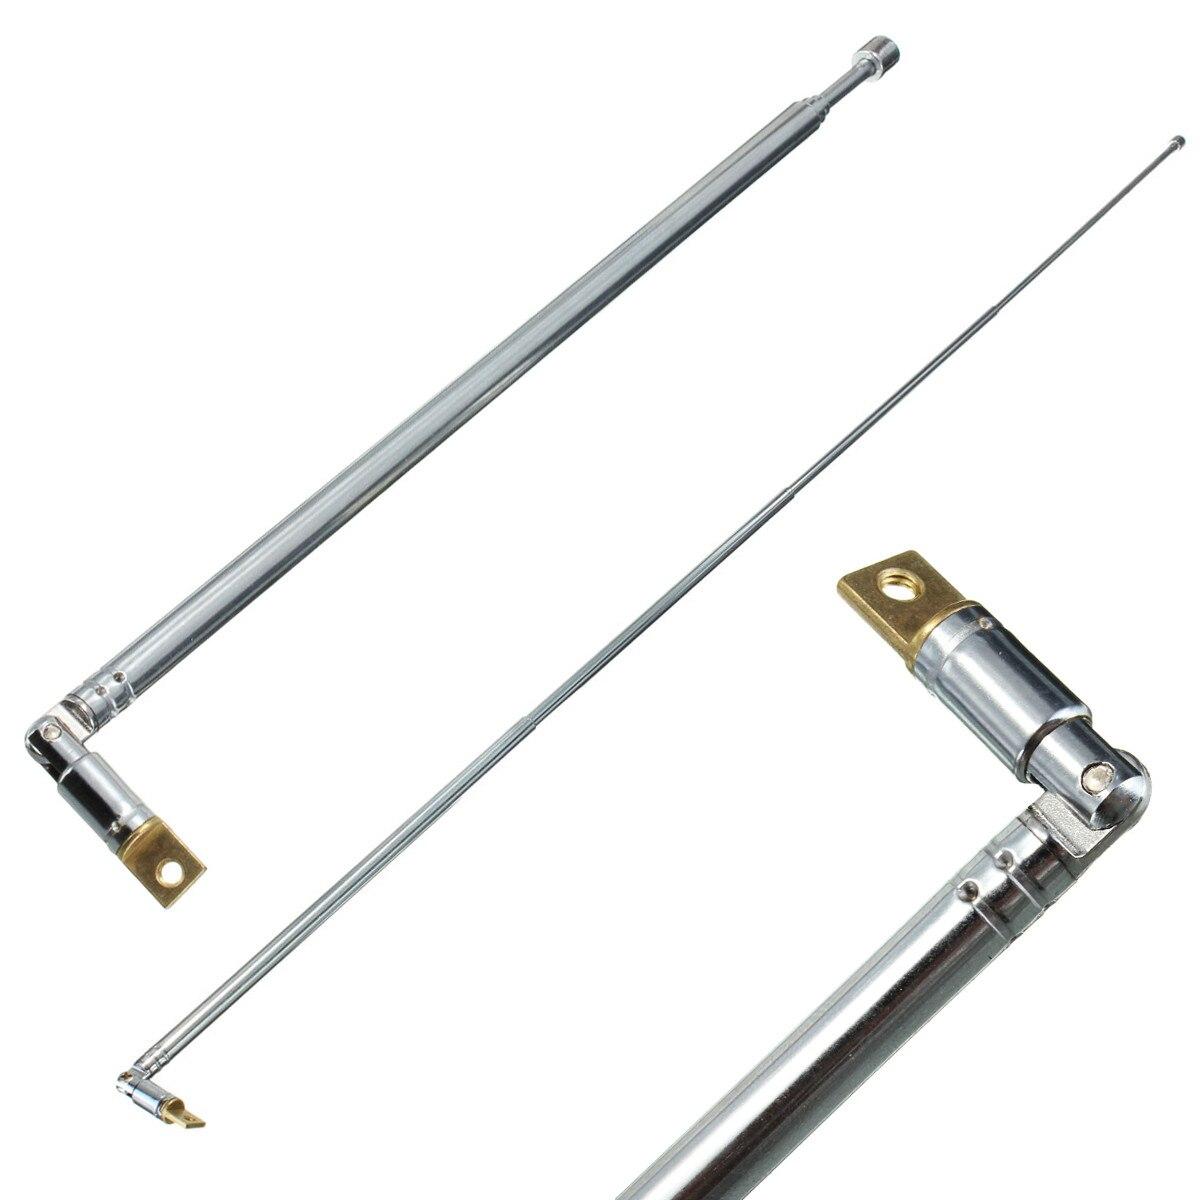 Hot sale durable 310991702355 am fm radio telescopic for Antenne radio fm interieur